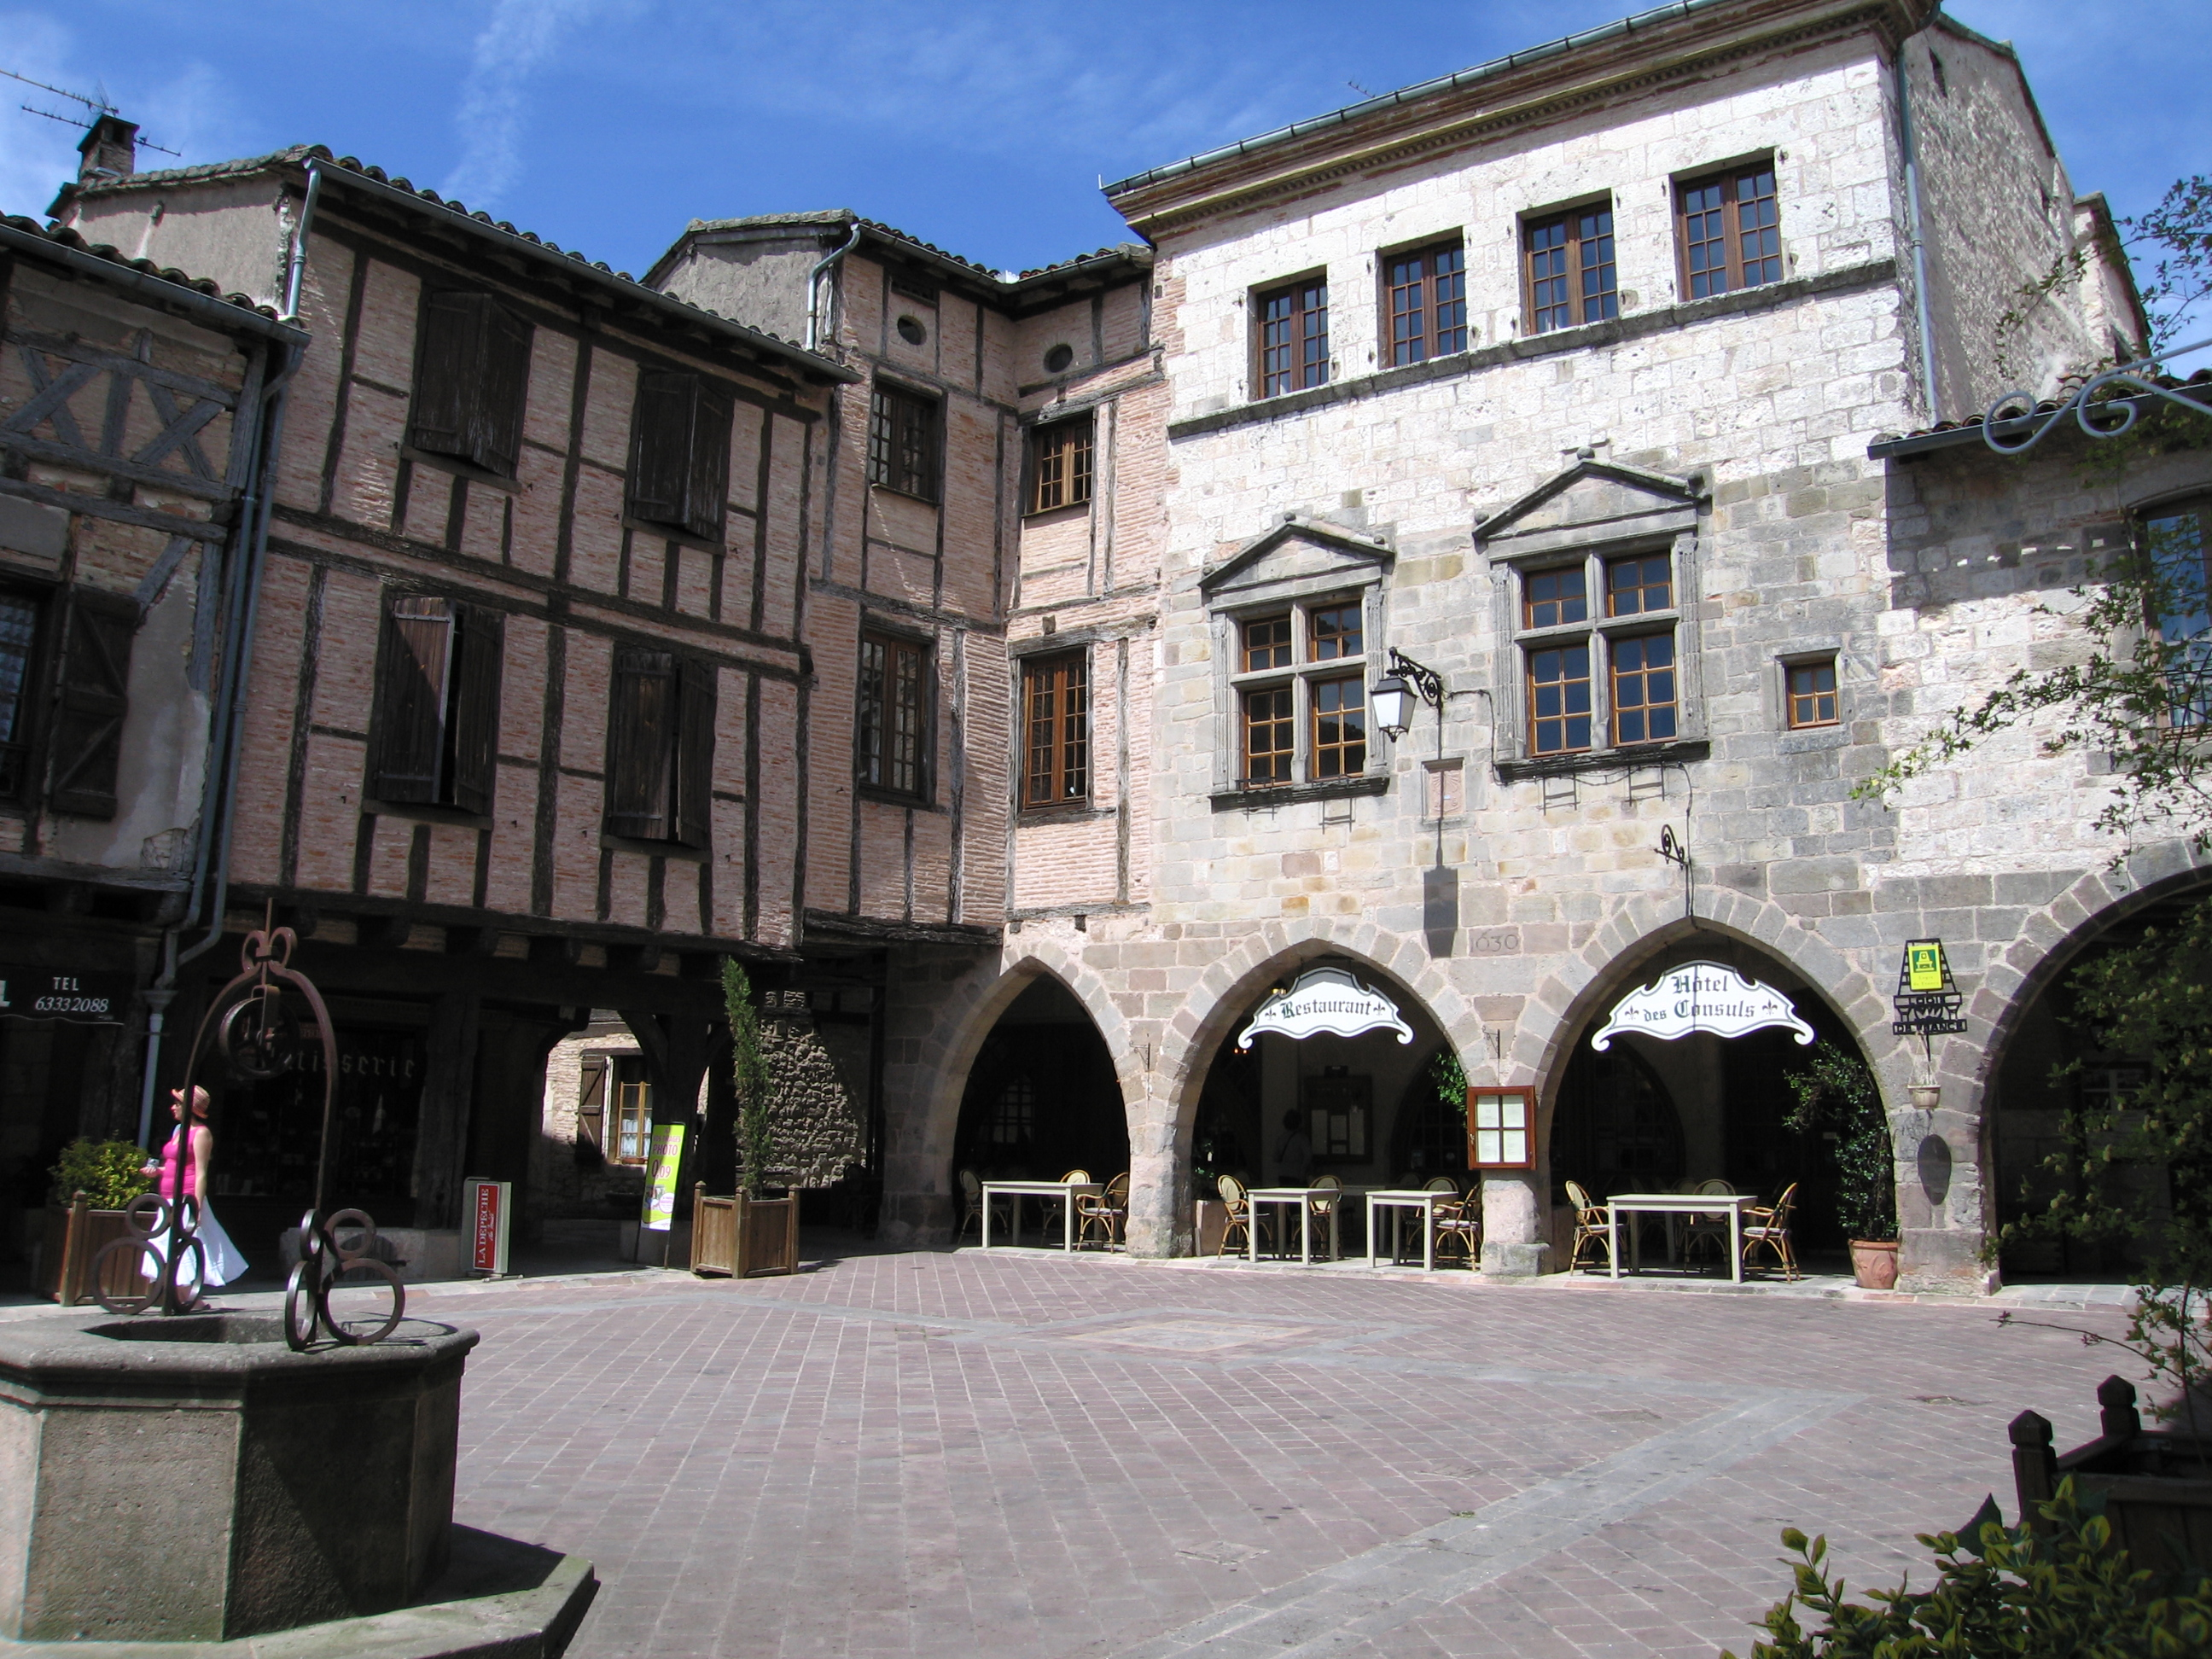 Castelnau-de-Montmiral is a commune in the Tarn department in southern ...: www.snipview.com/q/Castelnau-de-Montmiral